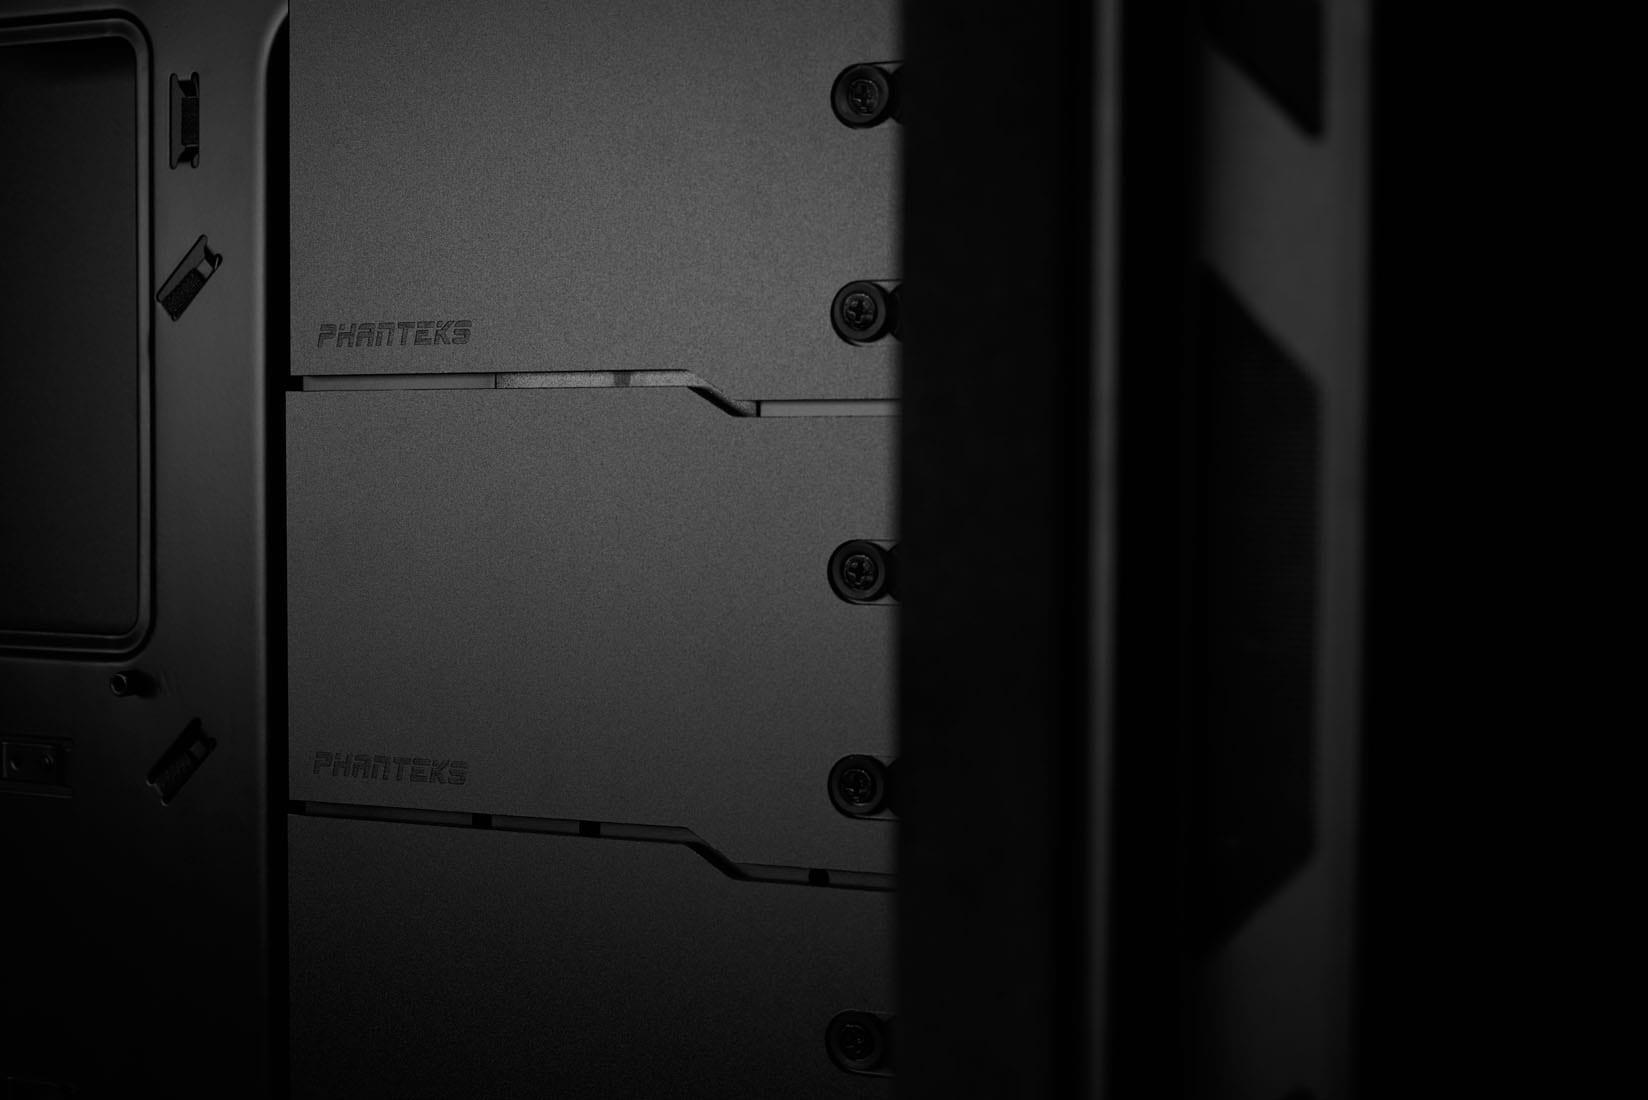 Phanteks_Studio8426